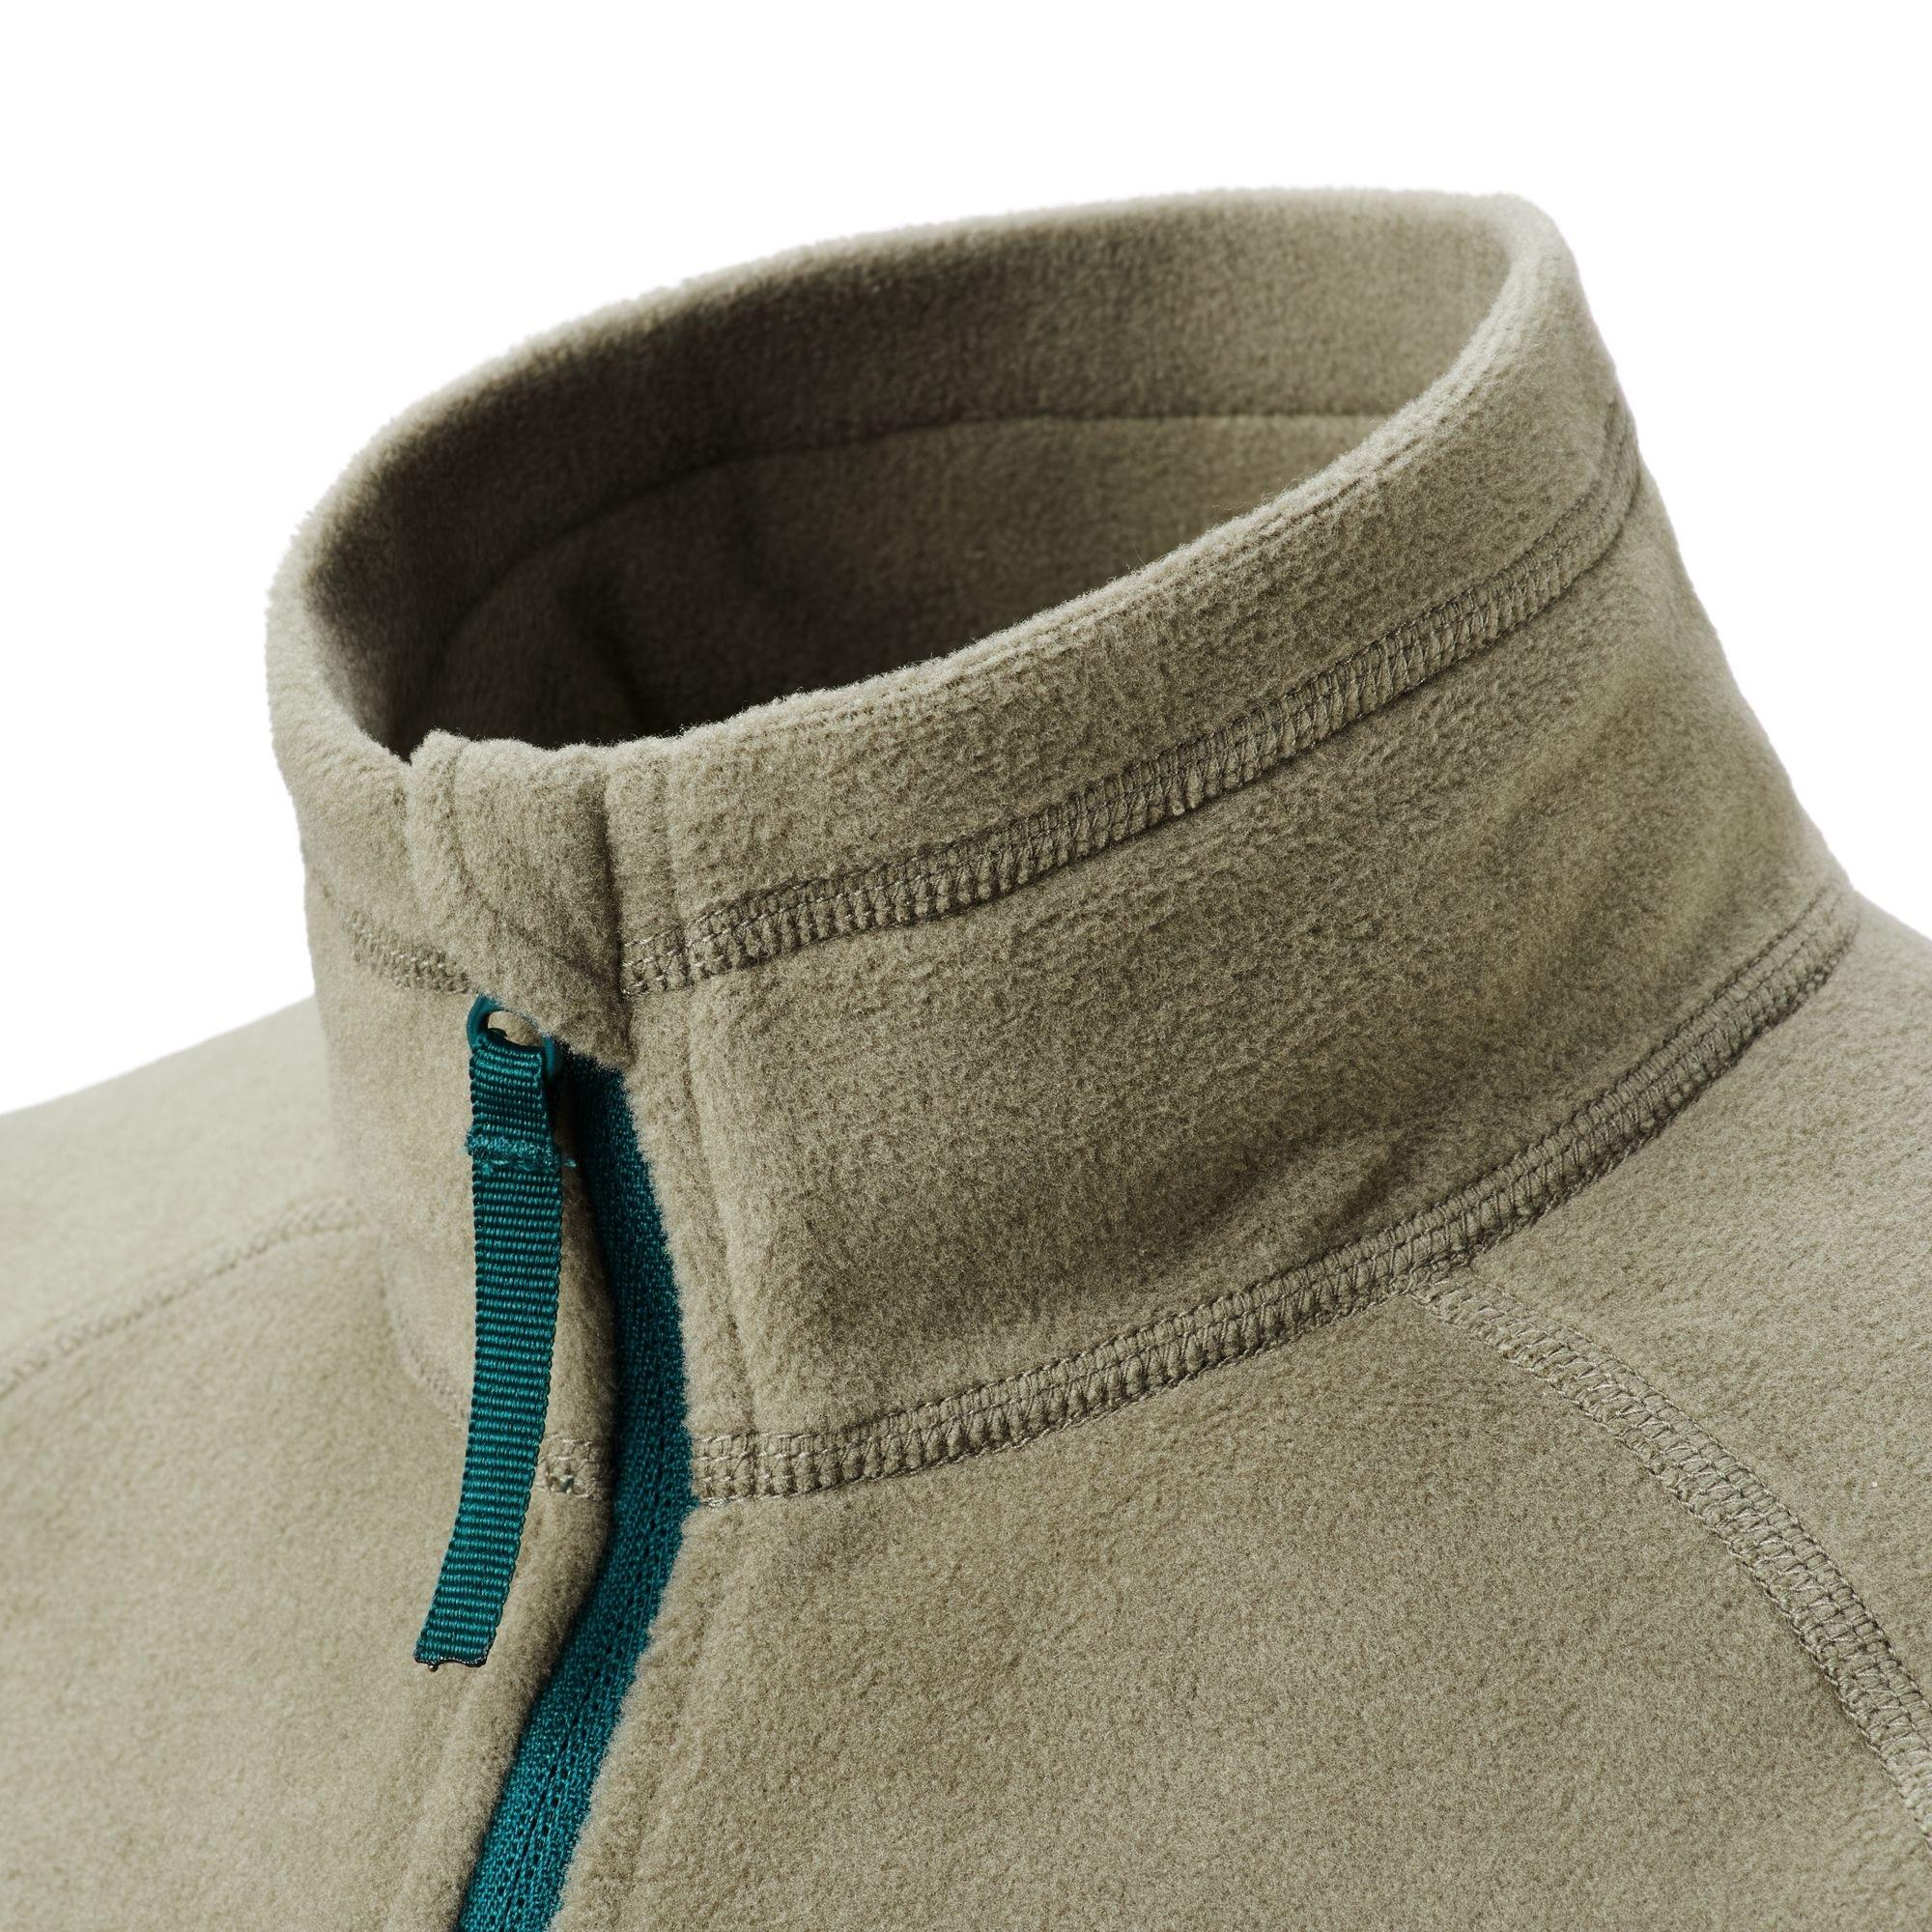 NEW-Kathmandu-Ridge-Kids-039-Girls-039-Boys-039-Warm-Fleece-Jacket-1-4-Zip-Pullover-Top thumbnail 10